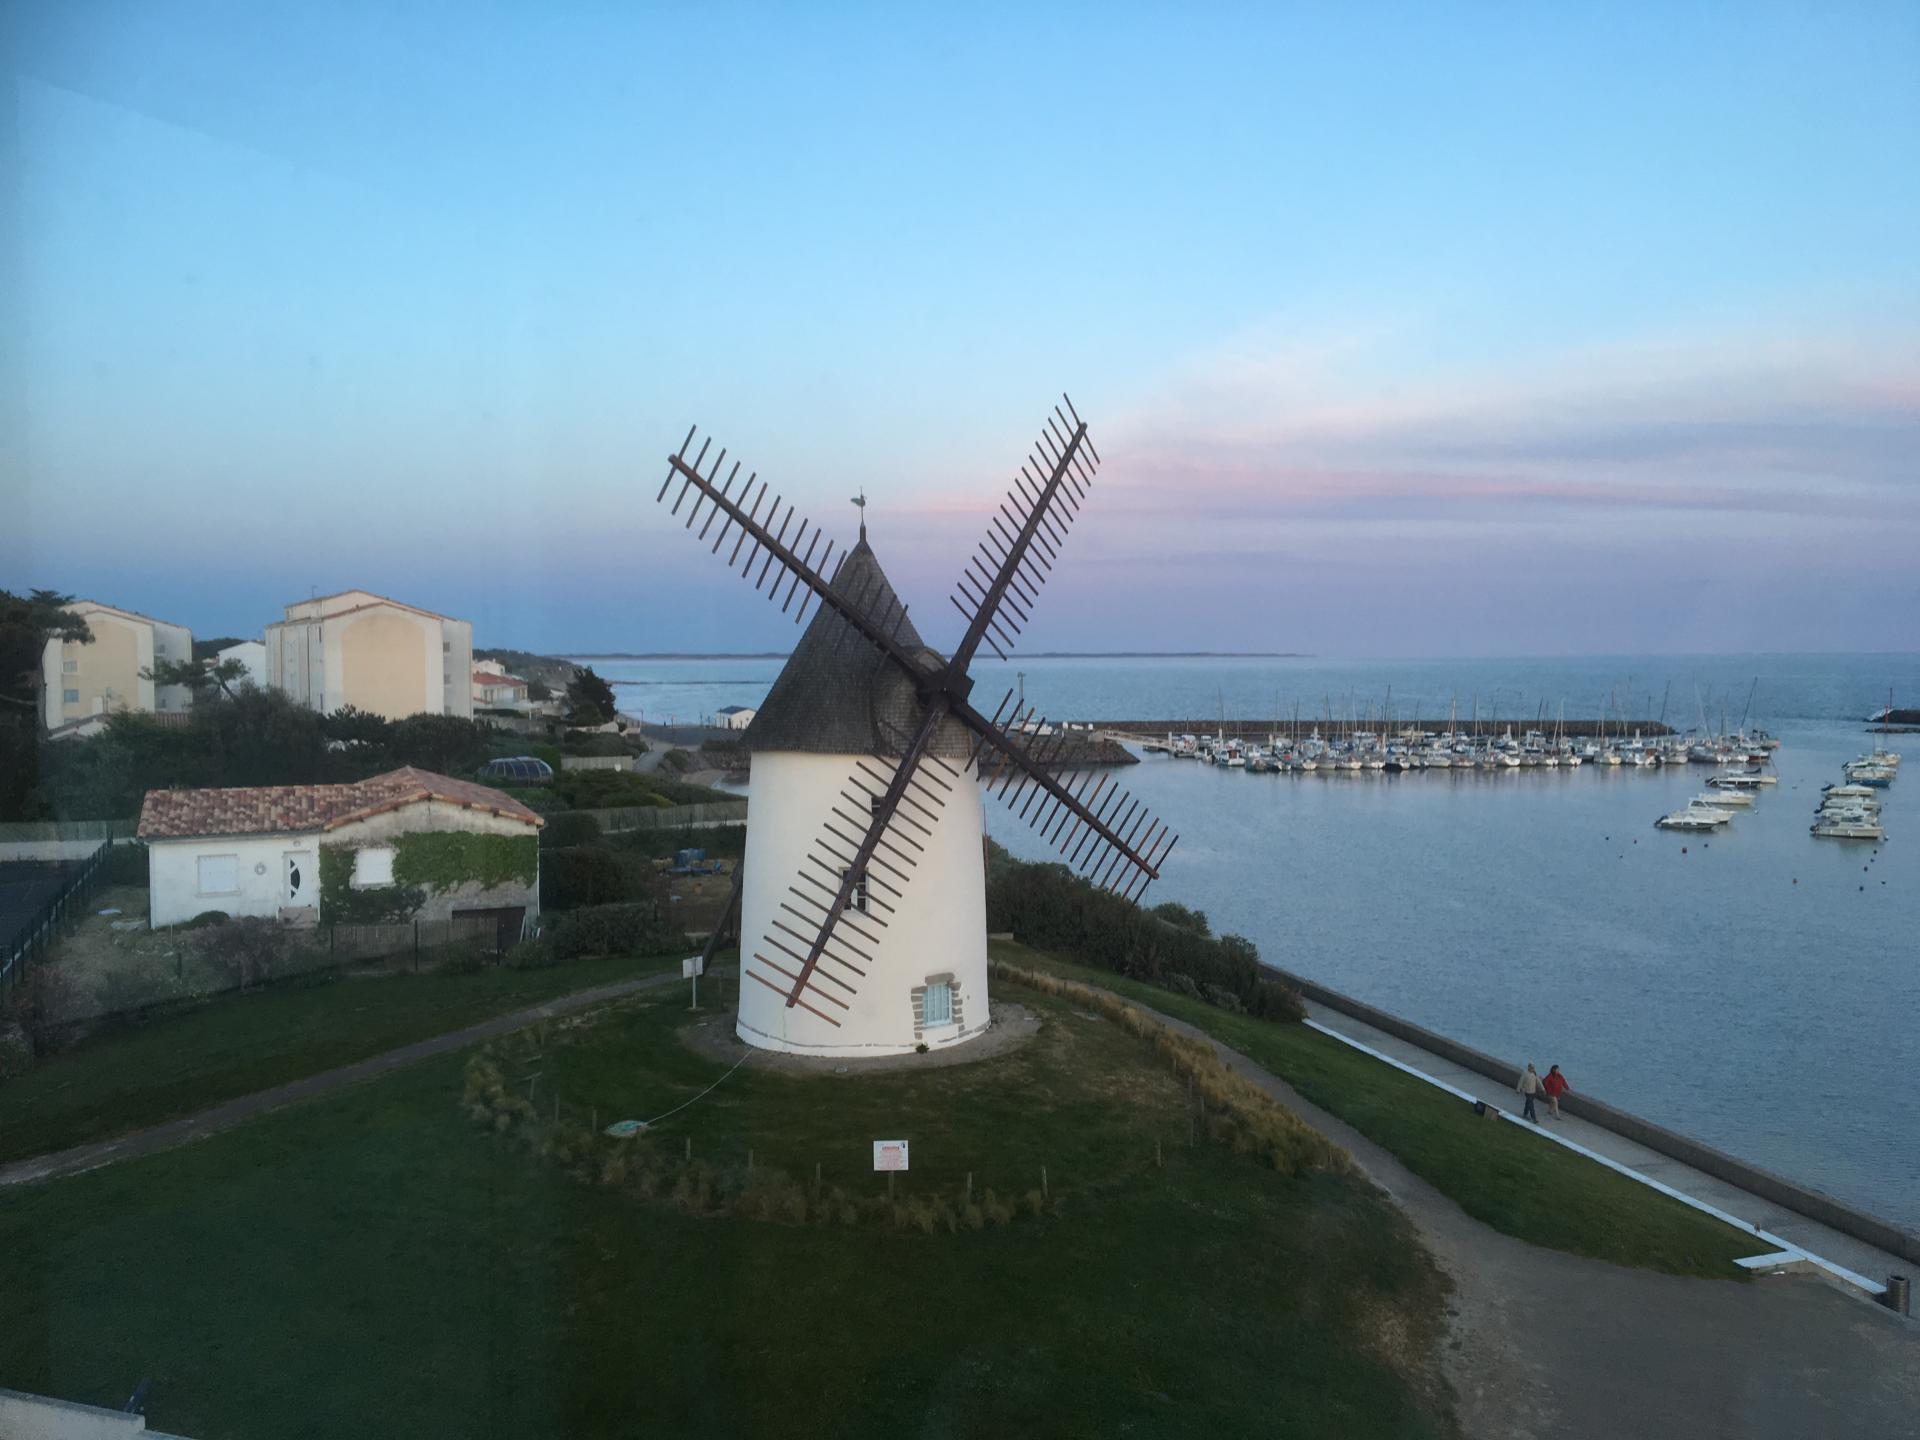 moulin de Conchette